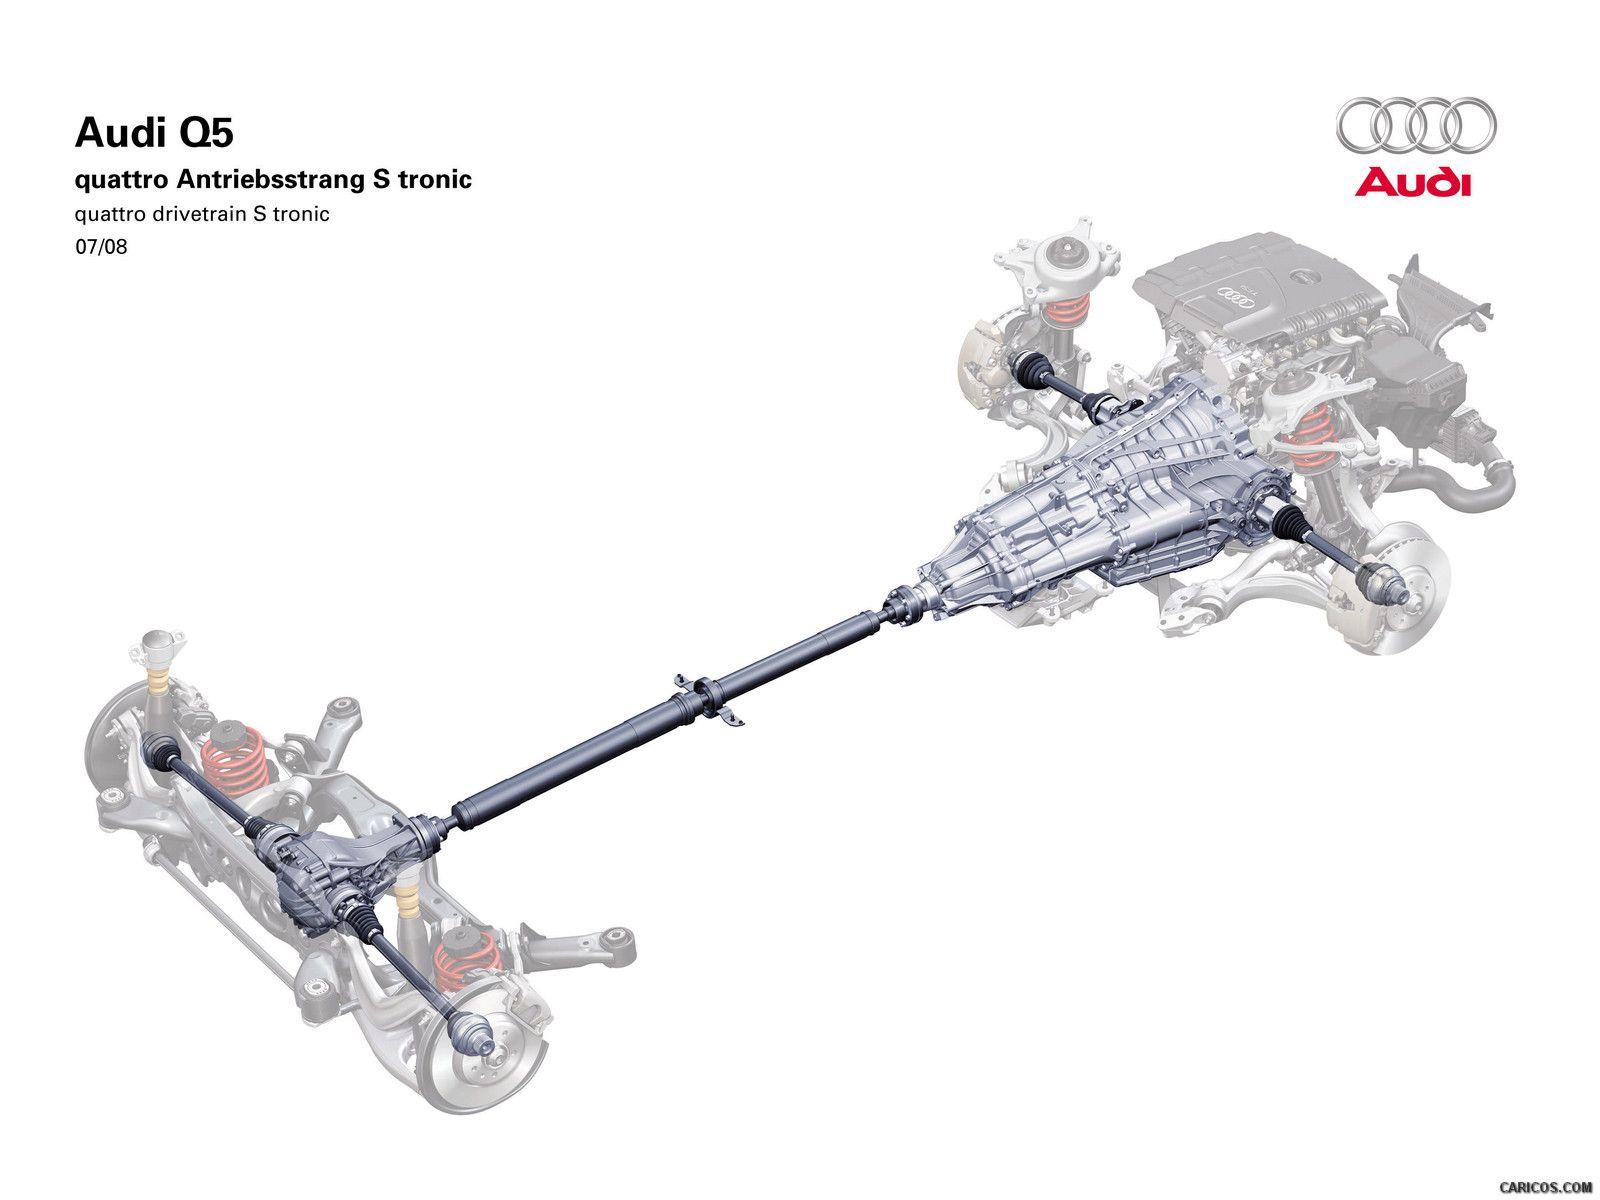 Audi Q5 Quattro Drivetrain S Tronic